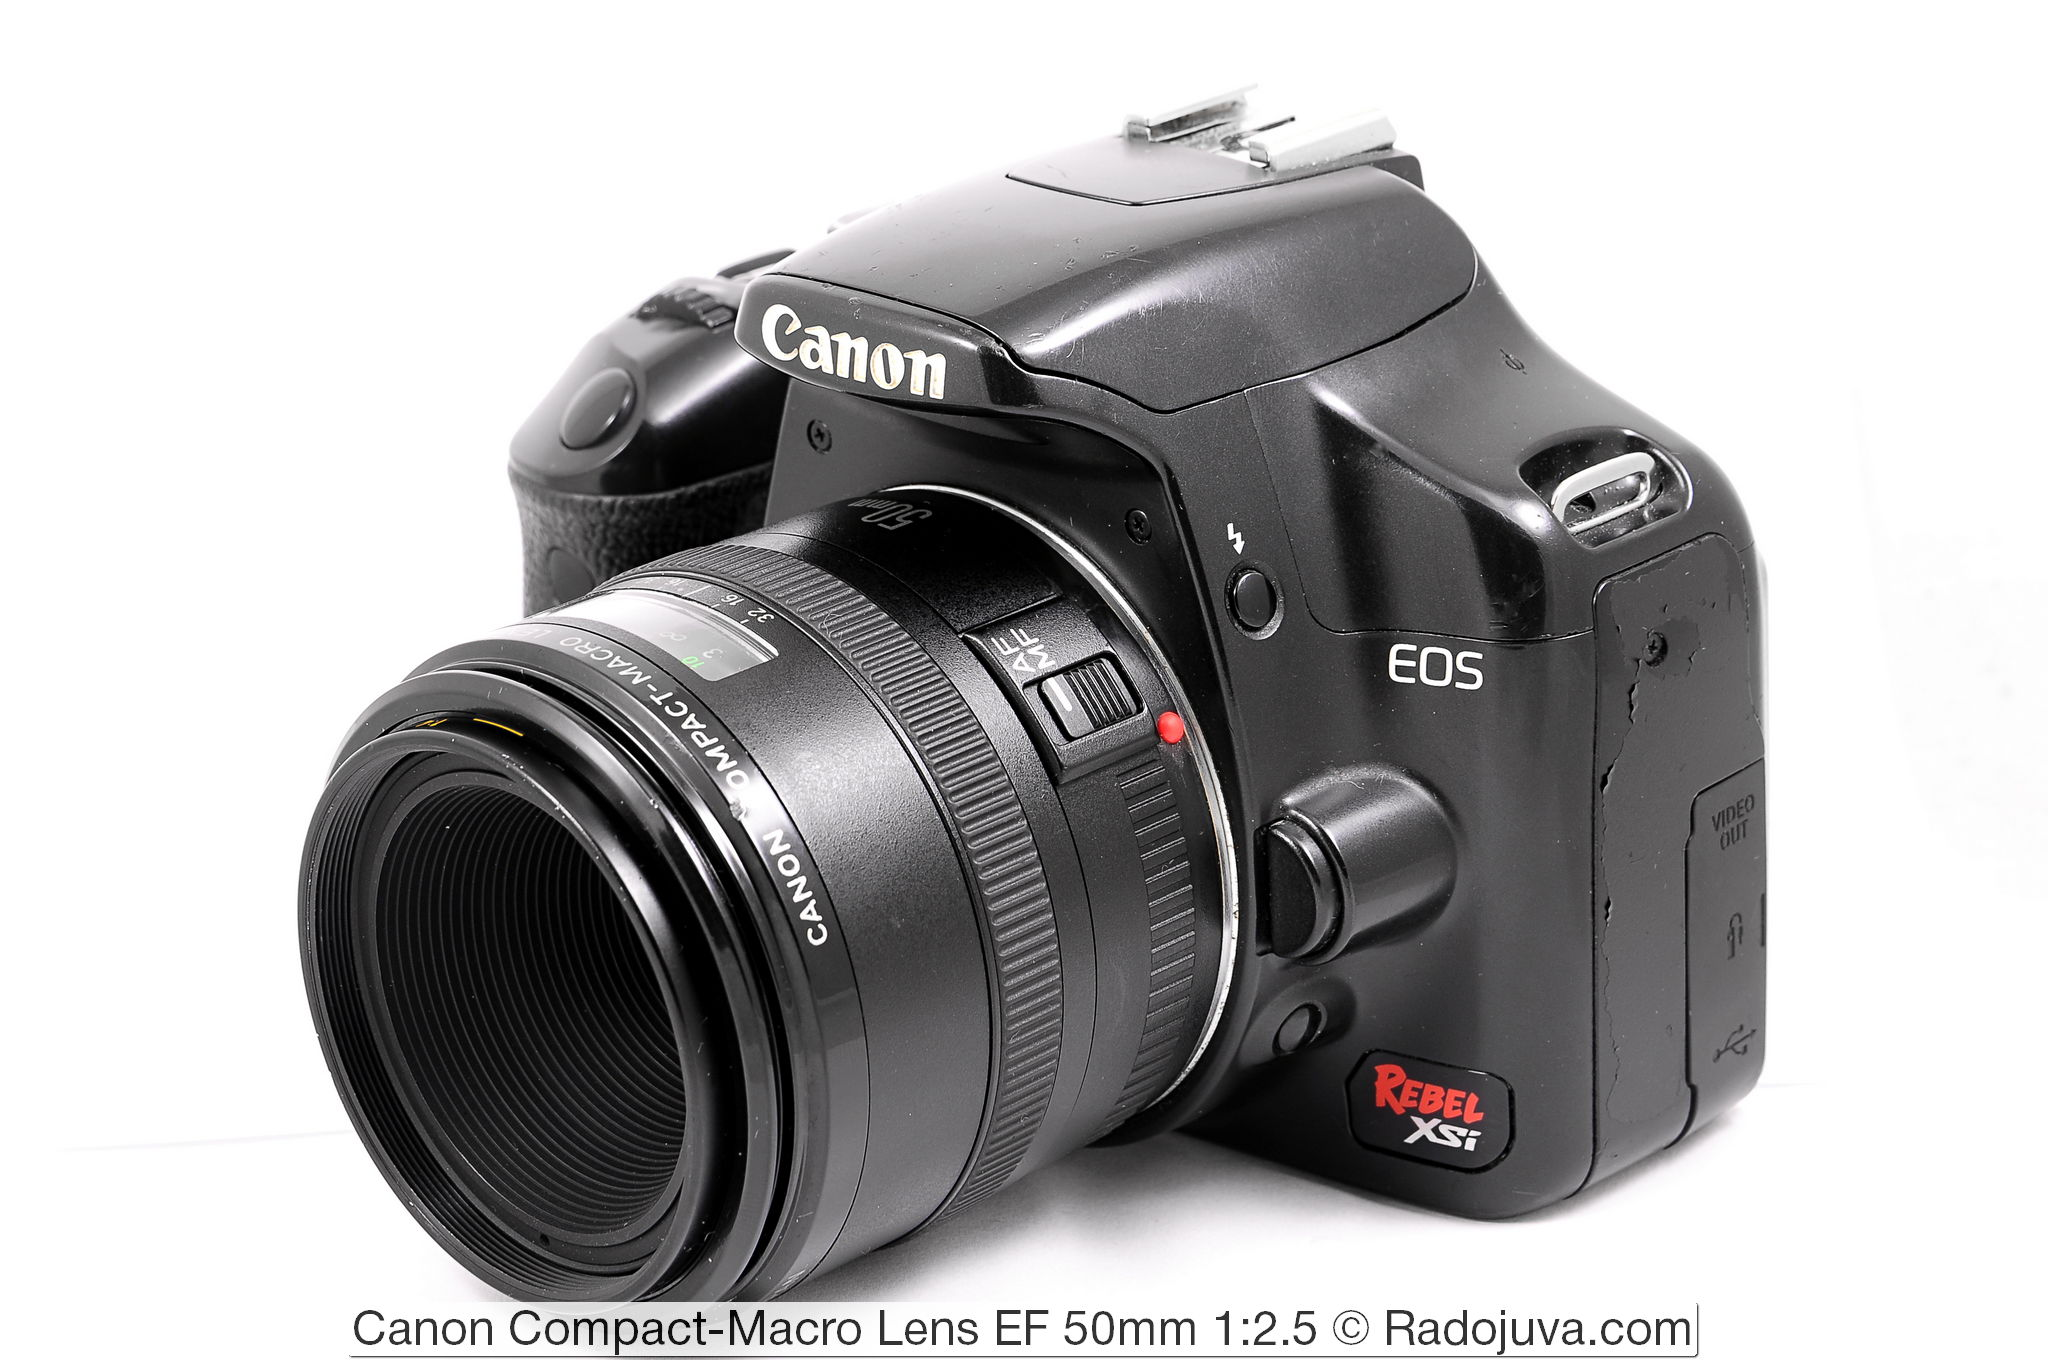 Canon Compact-Macro Lens EF 50mm 1:2.5